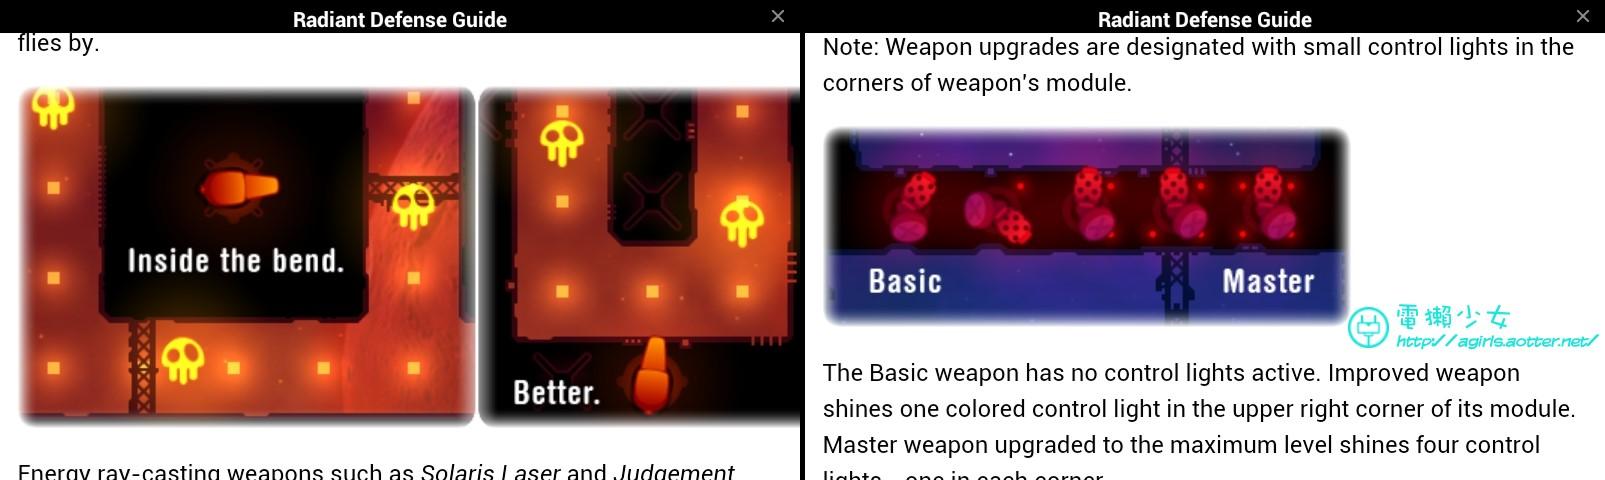 radiant defence_武器擺放教學